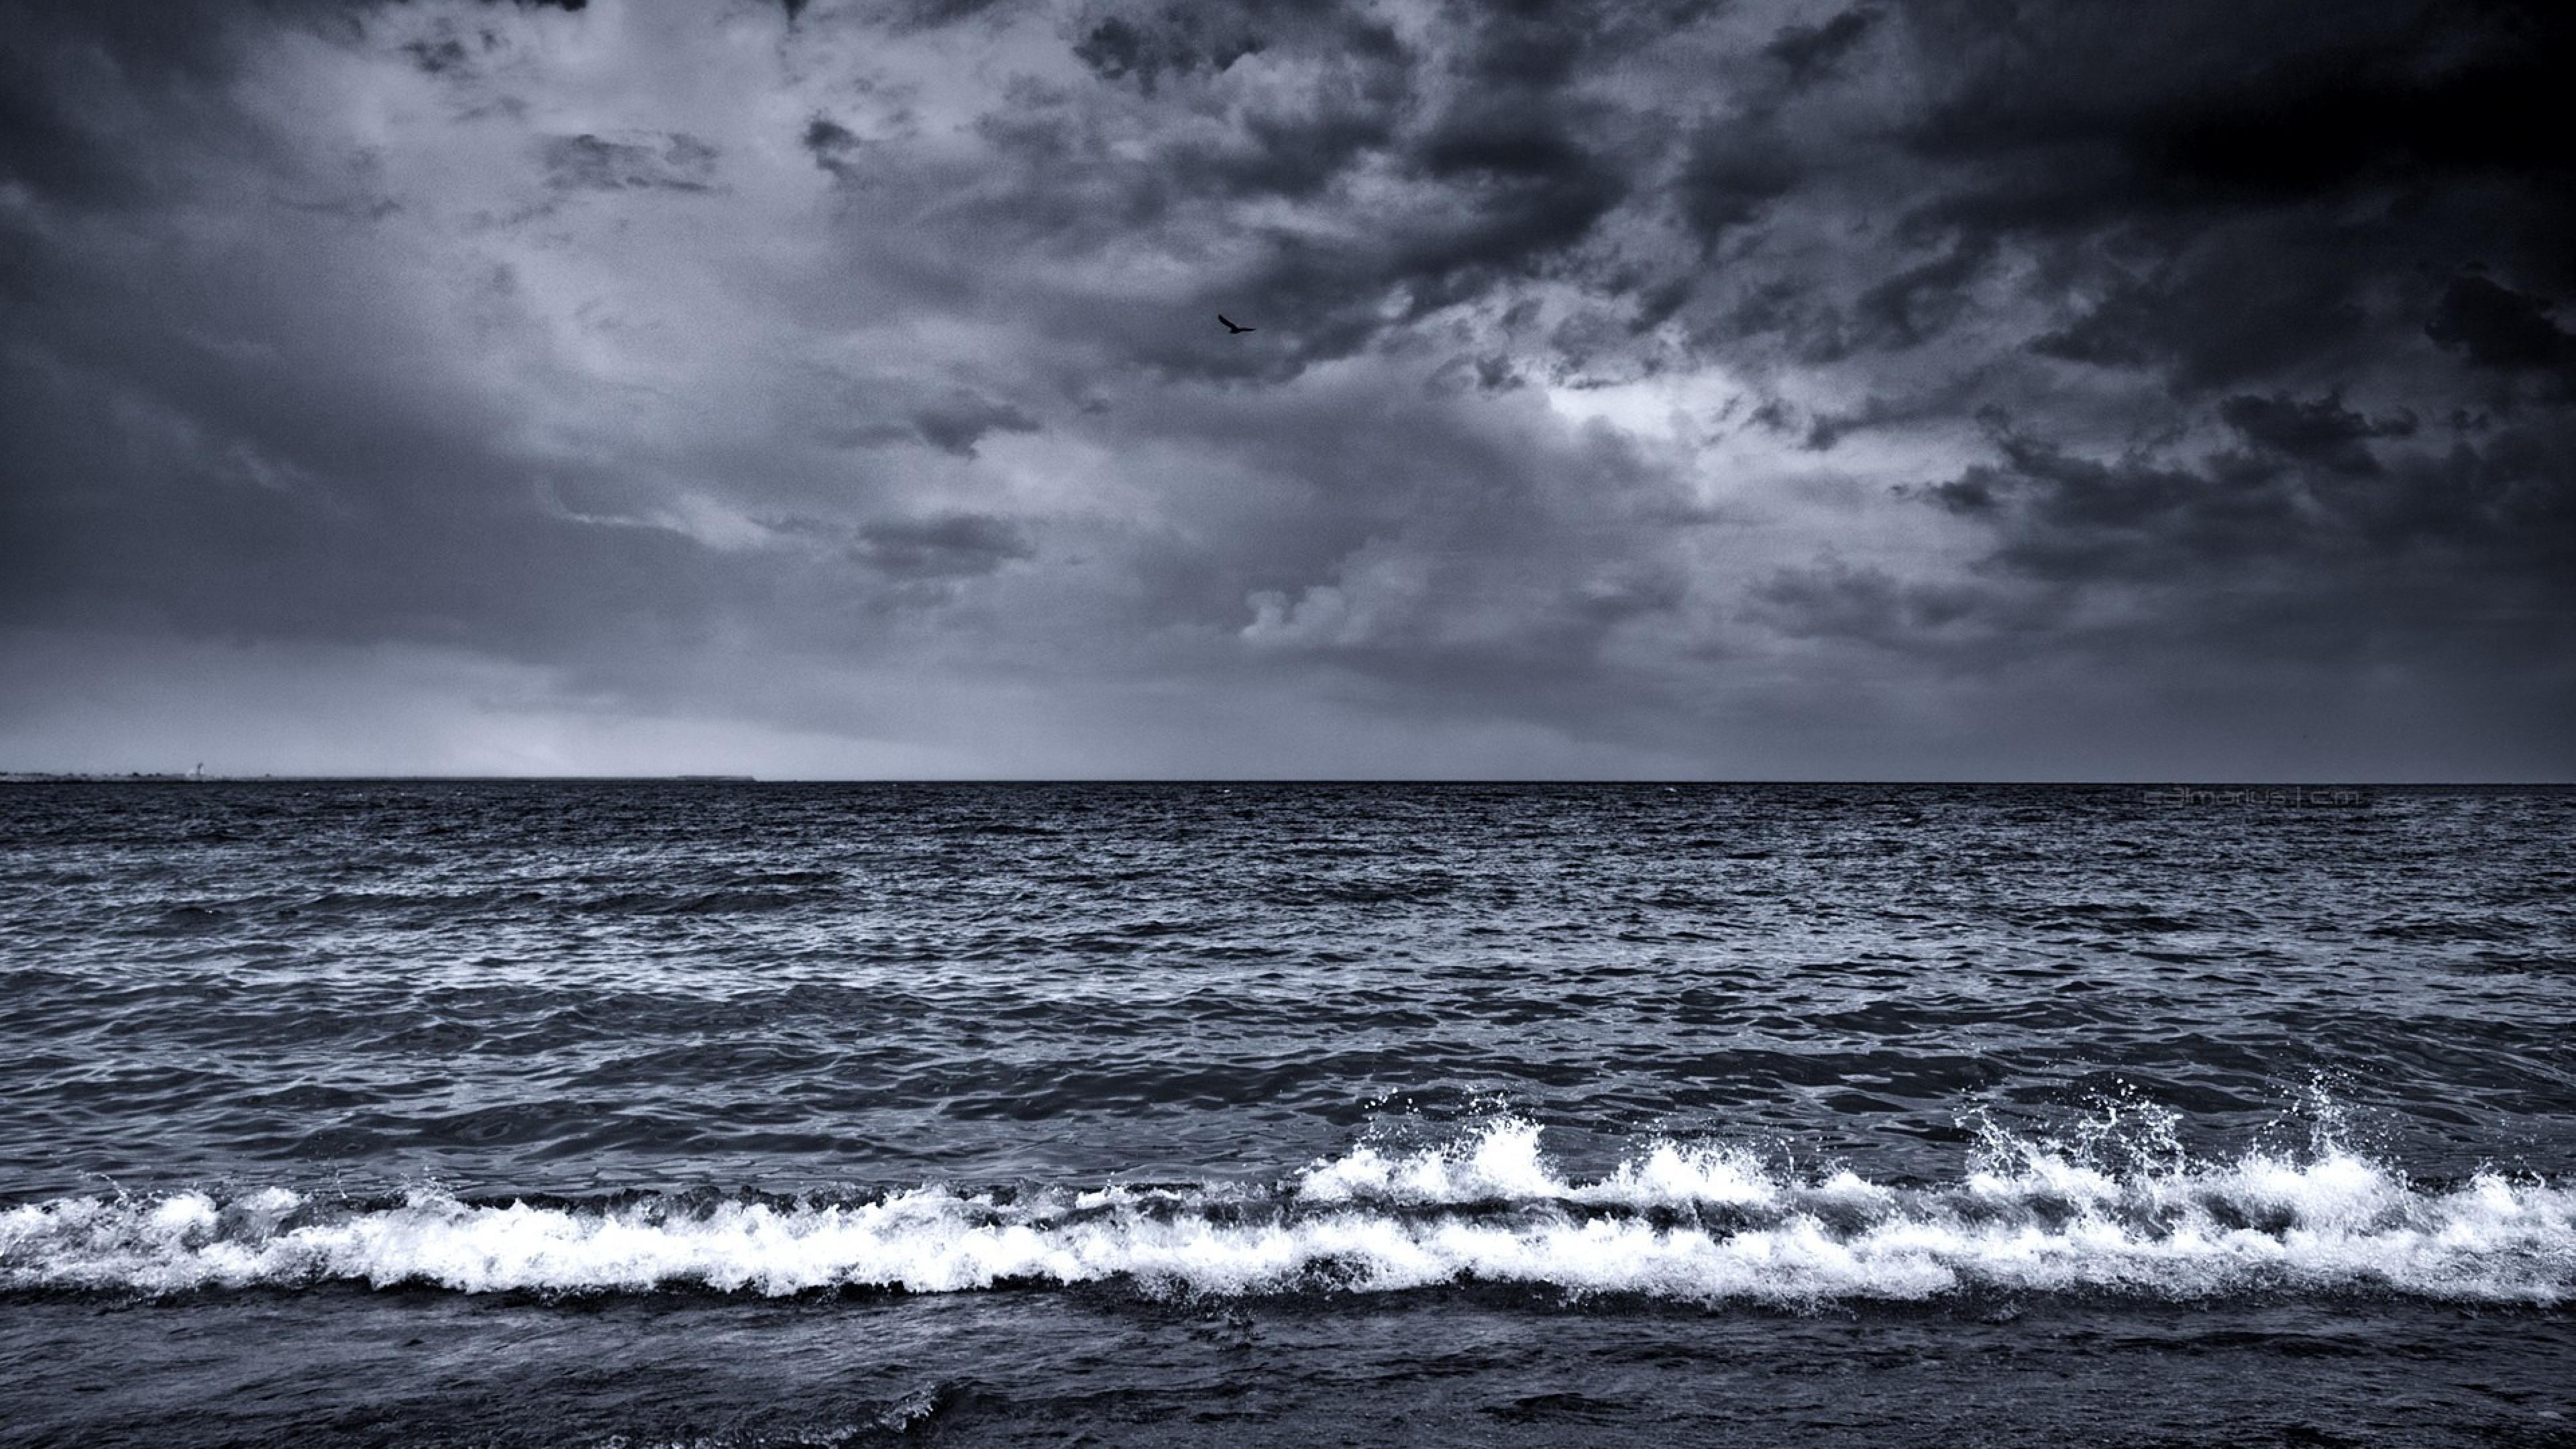 Waves Surf Foam Black and white Wallpaper Background 4K Ultra HD 3840x2160